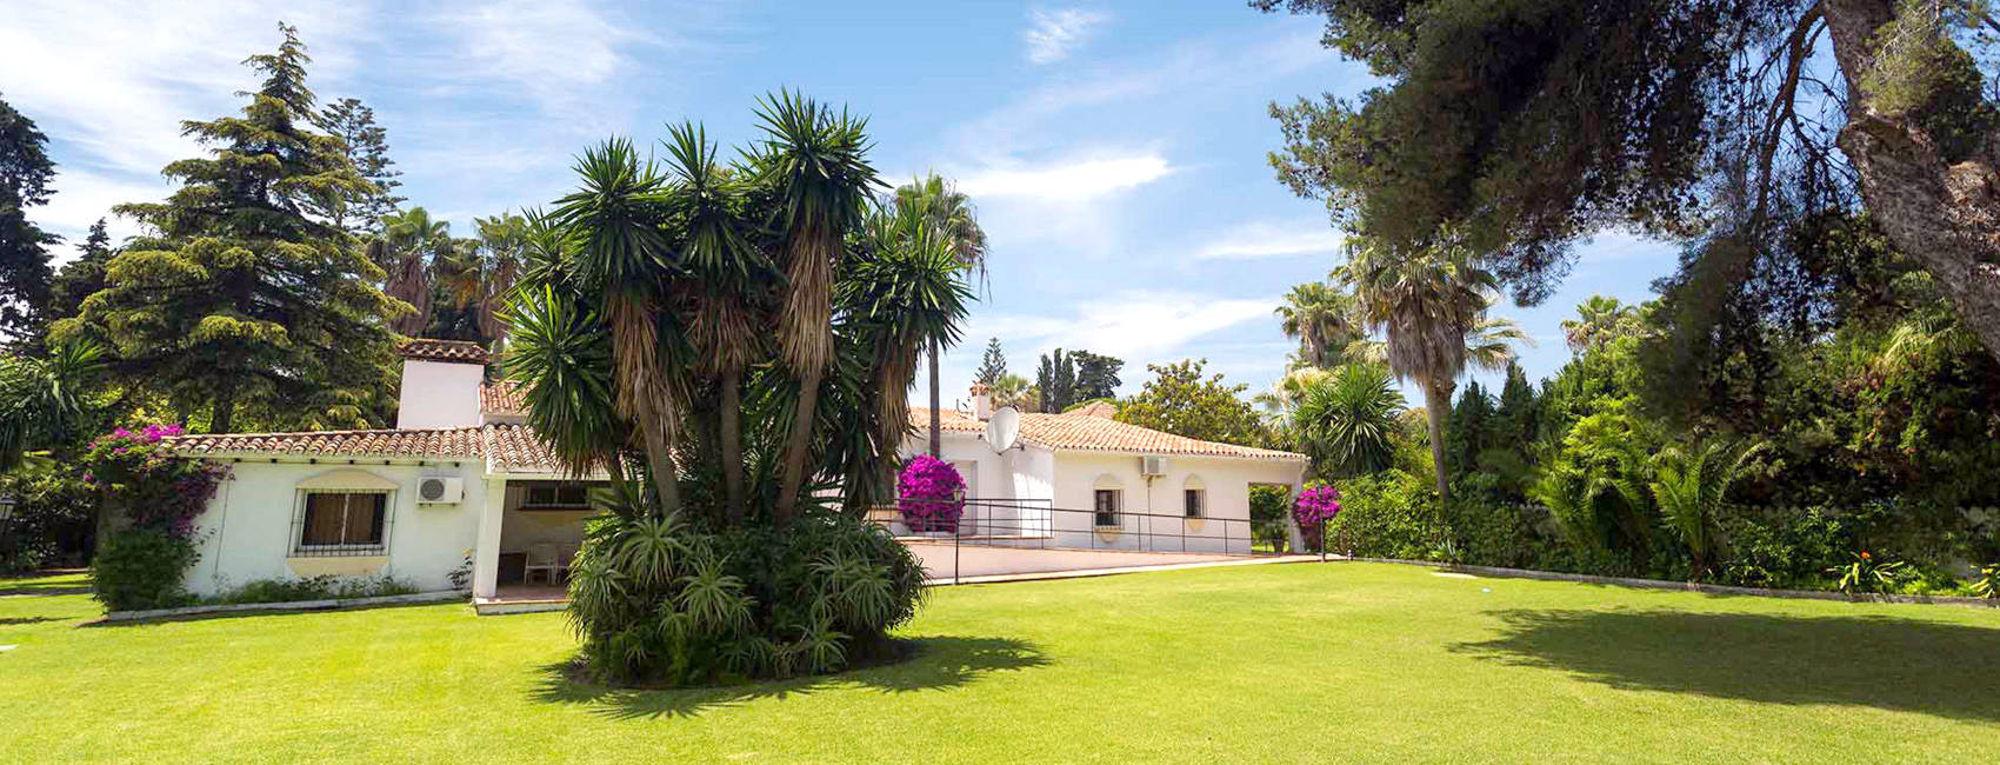 Drug Rehab Center in Marbella - Garden